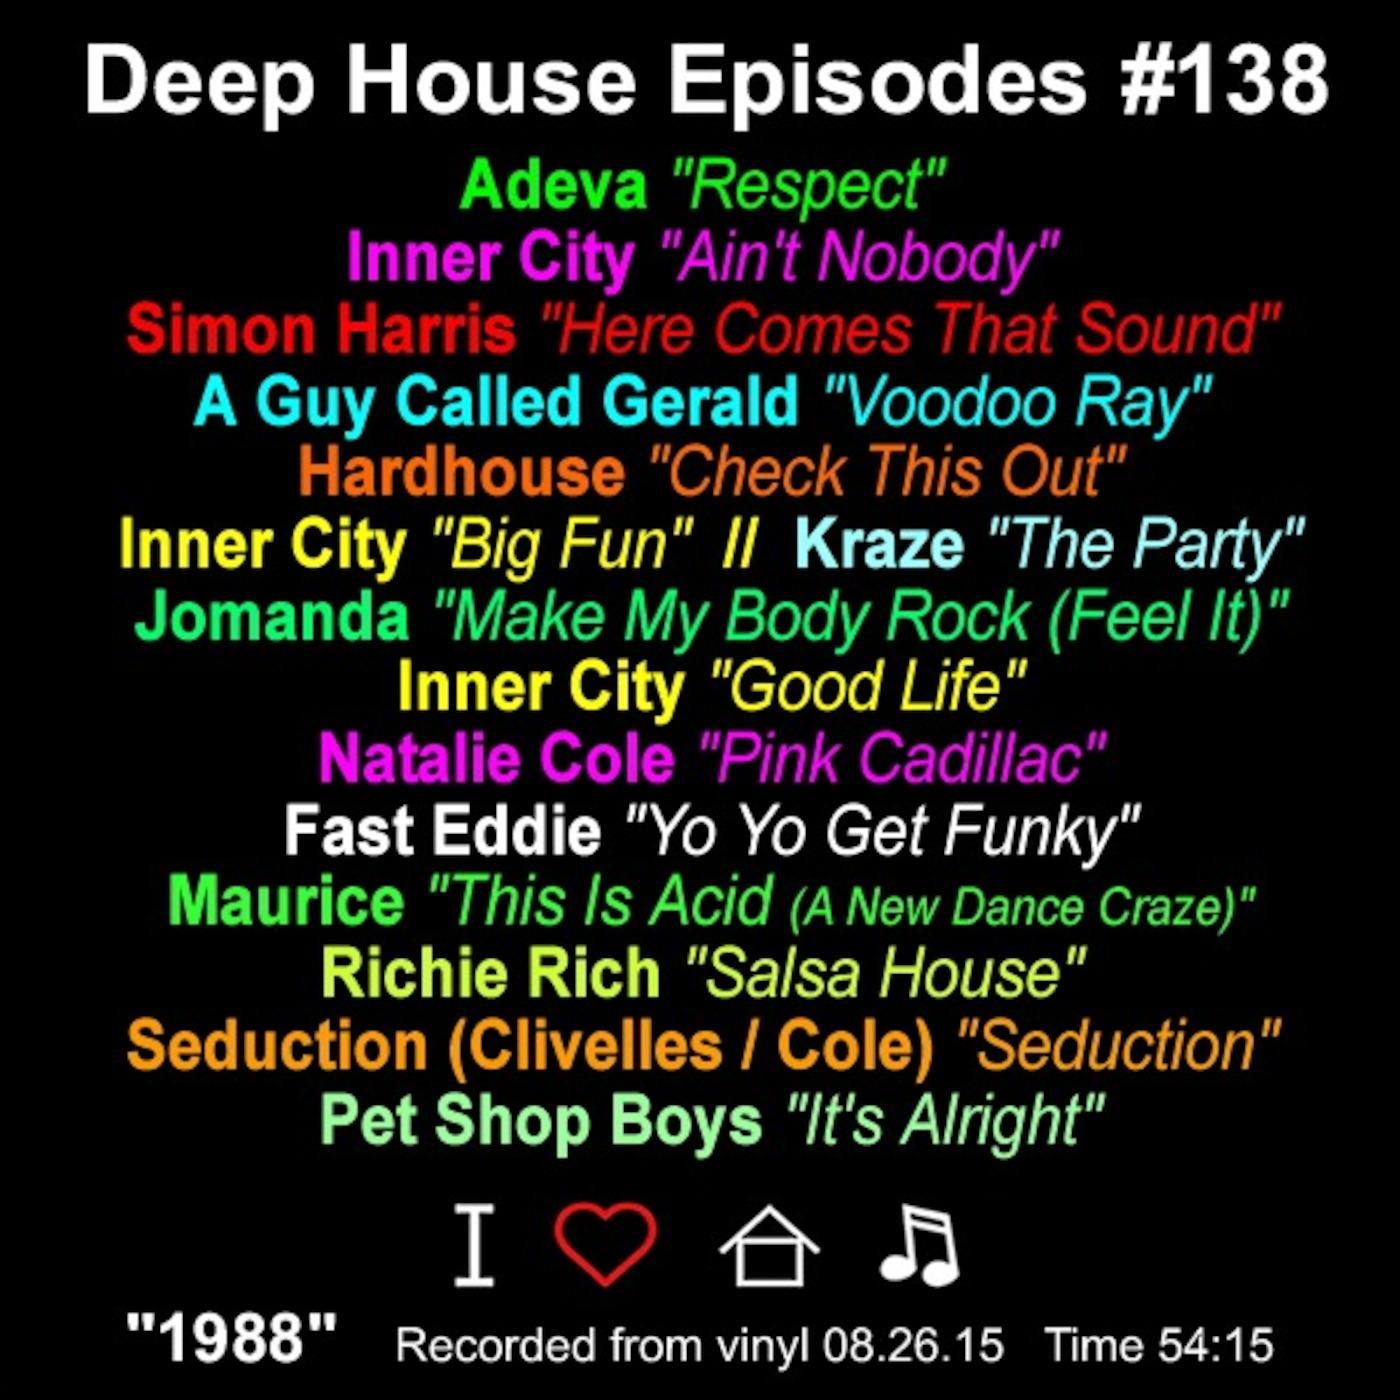 Deep House Episodes - TopPodcast com